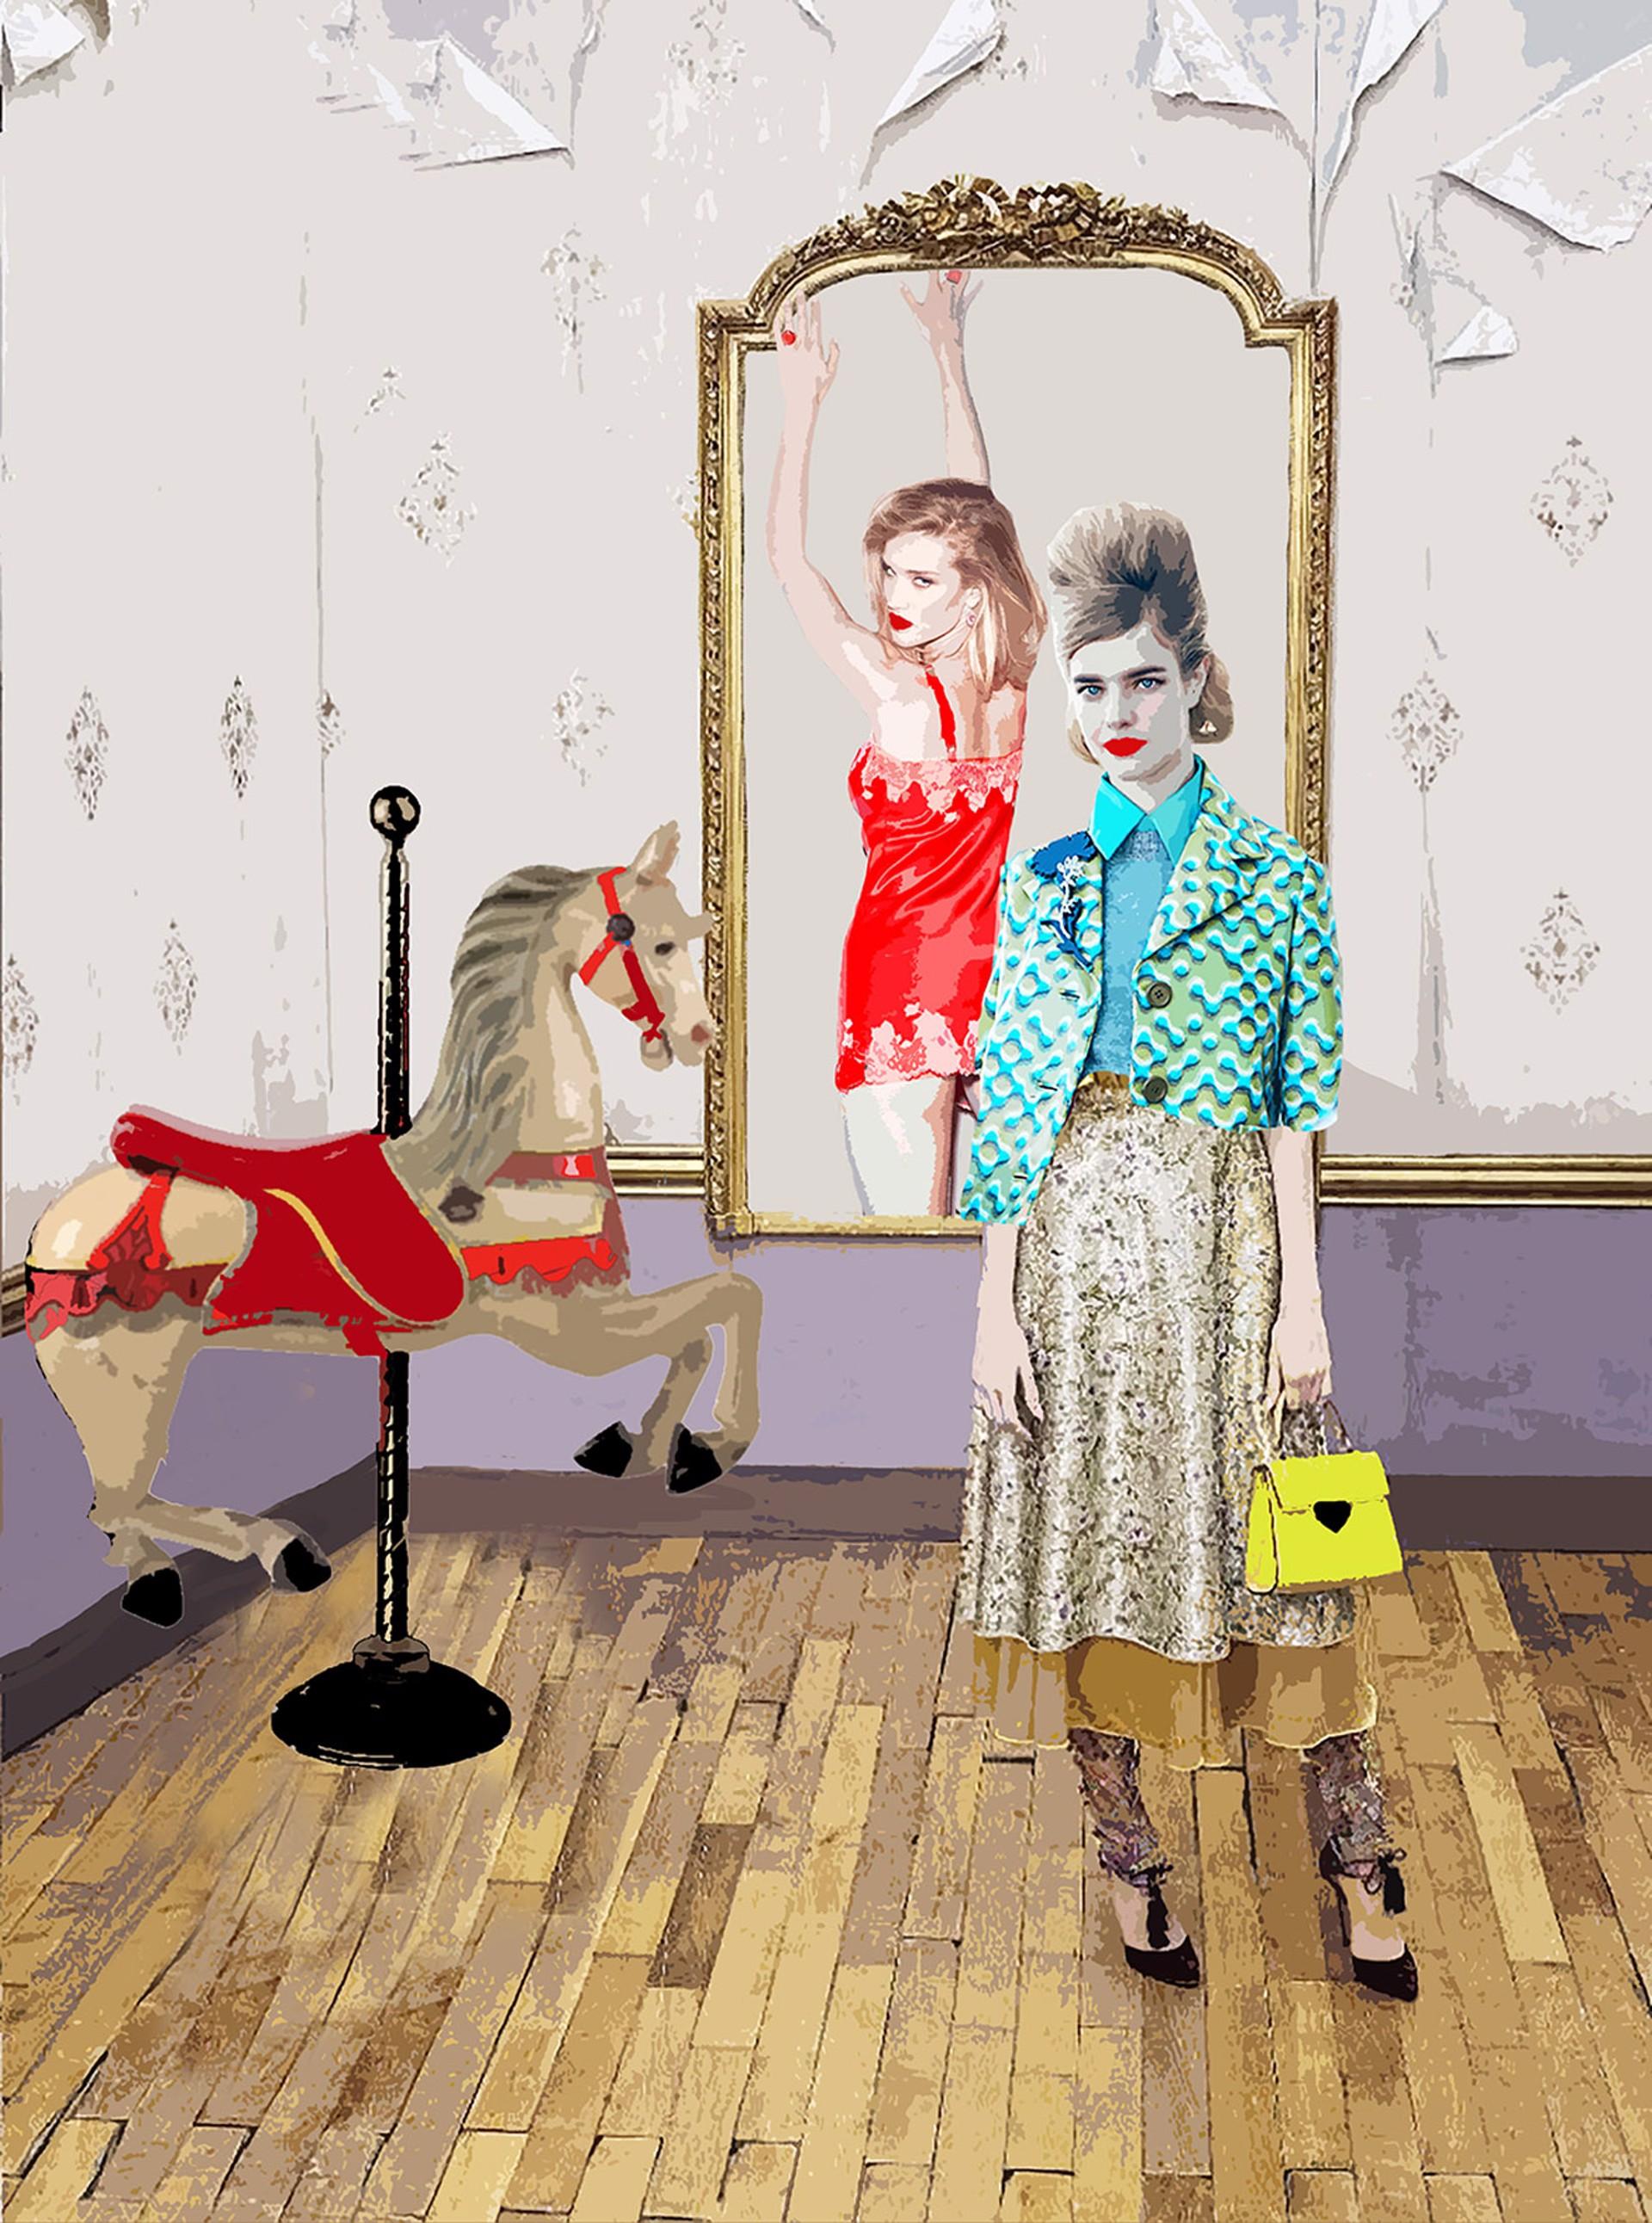 Penelope and Klara Was Ziehe ich Heute An by Billi Thanner